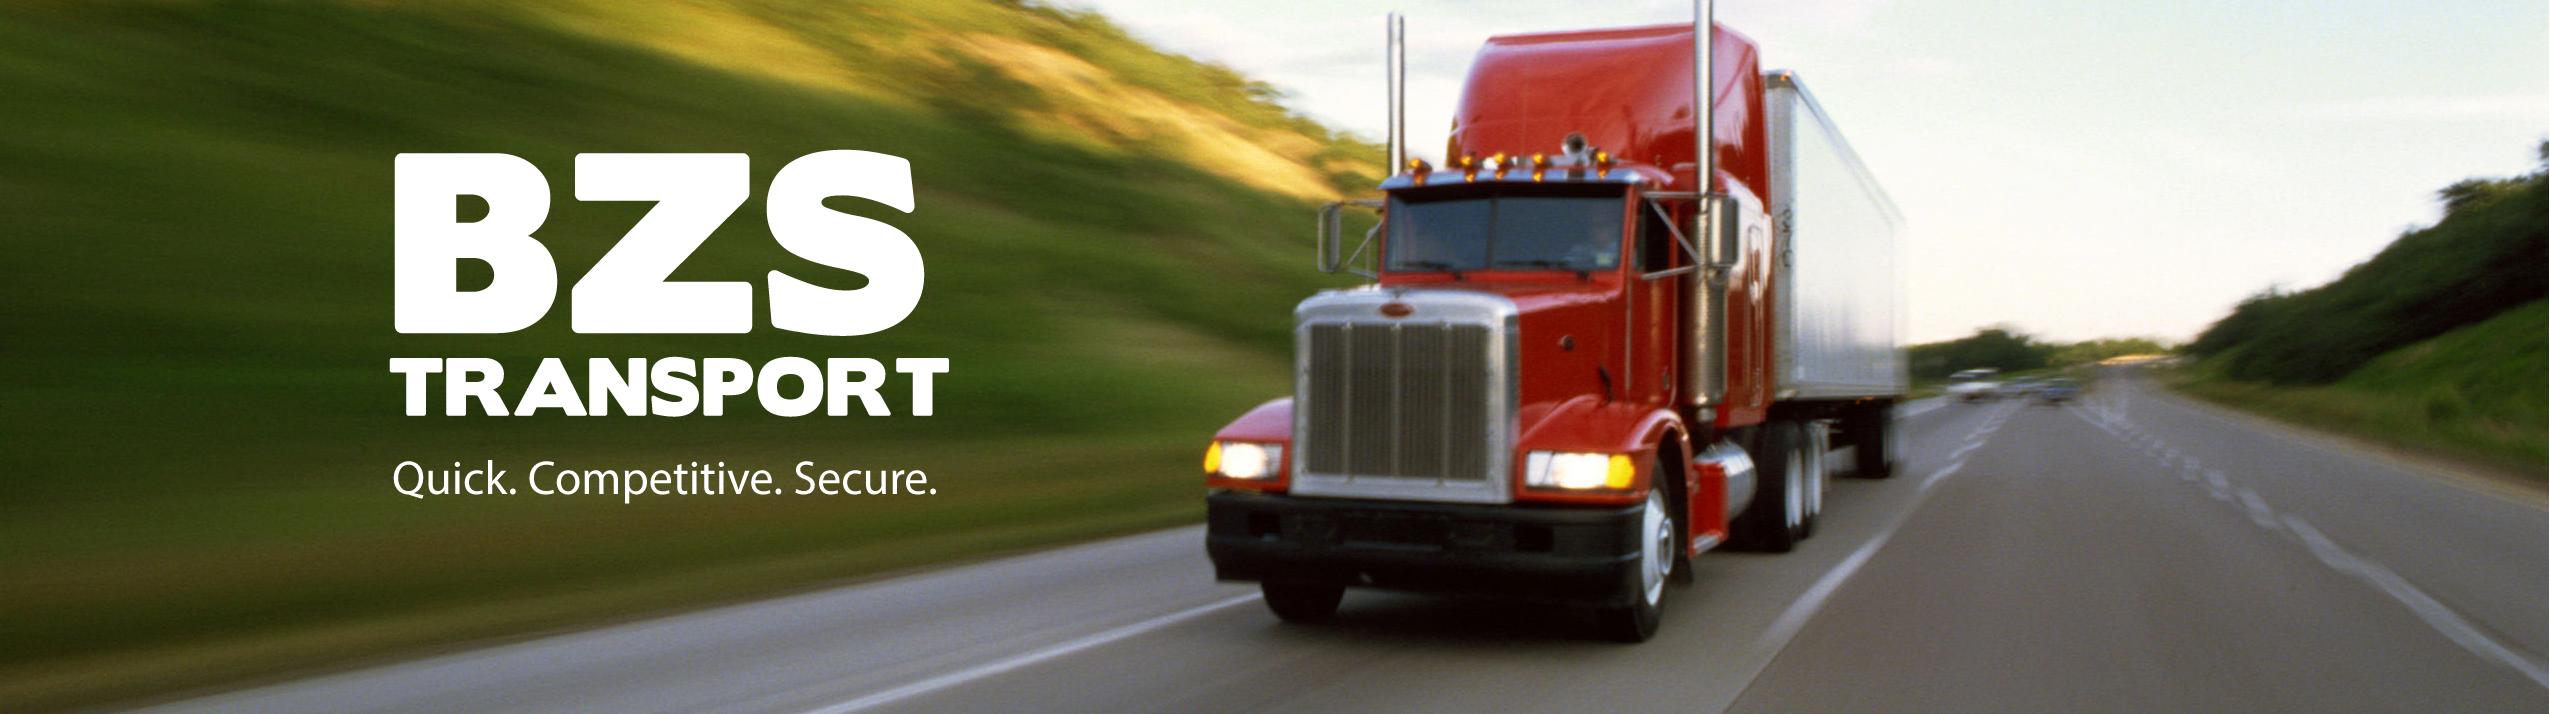 BZS Transport Inc  – FULL TRUCKLOADS   FTL  LTL   INTERMODAL